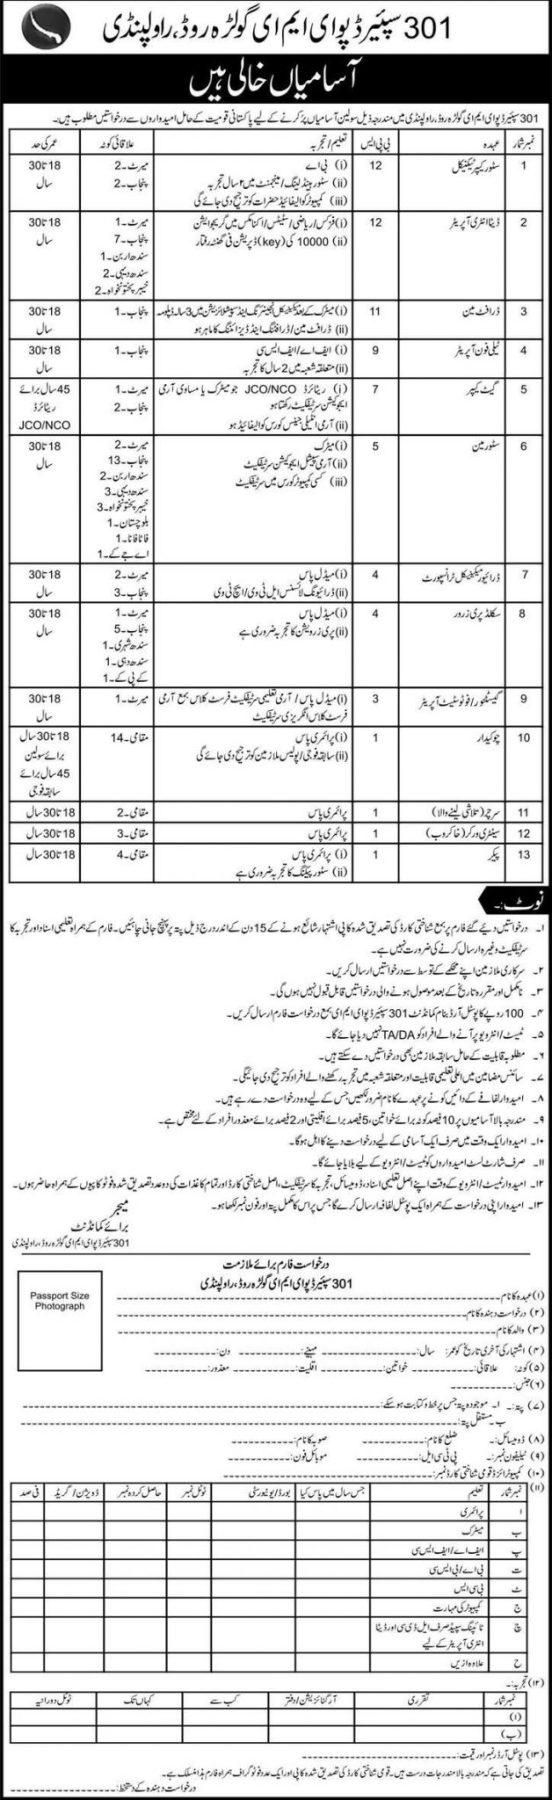 Spare Depo 301 EME Rawalpindi Jobs 2015 Application Form Eligibility Criteria Dates